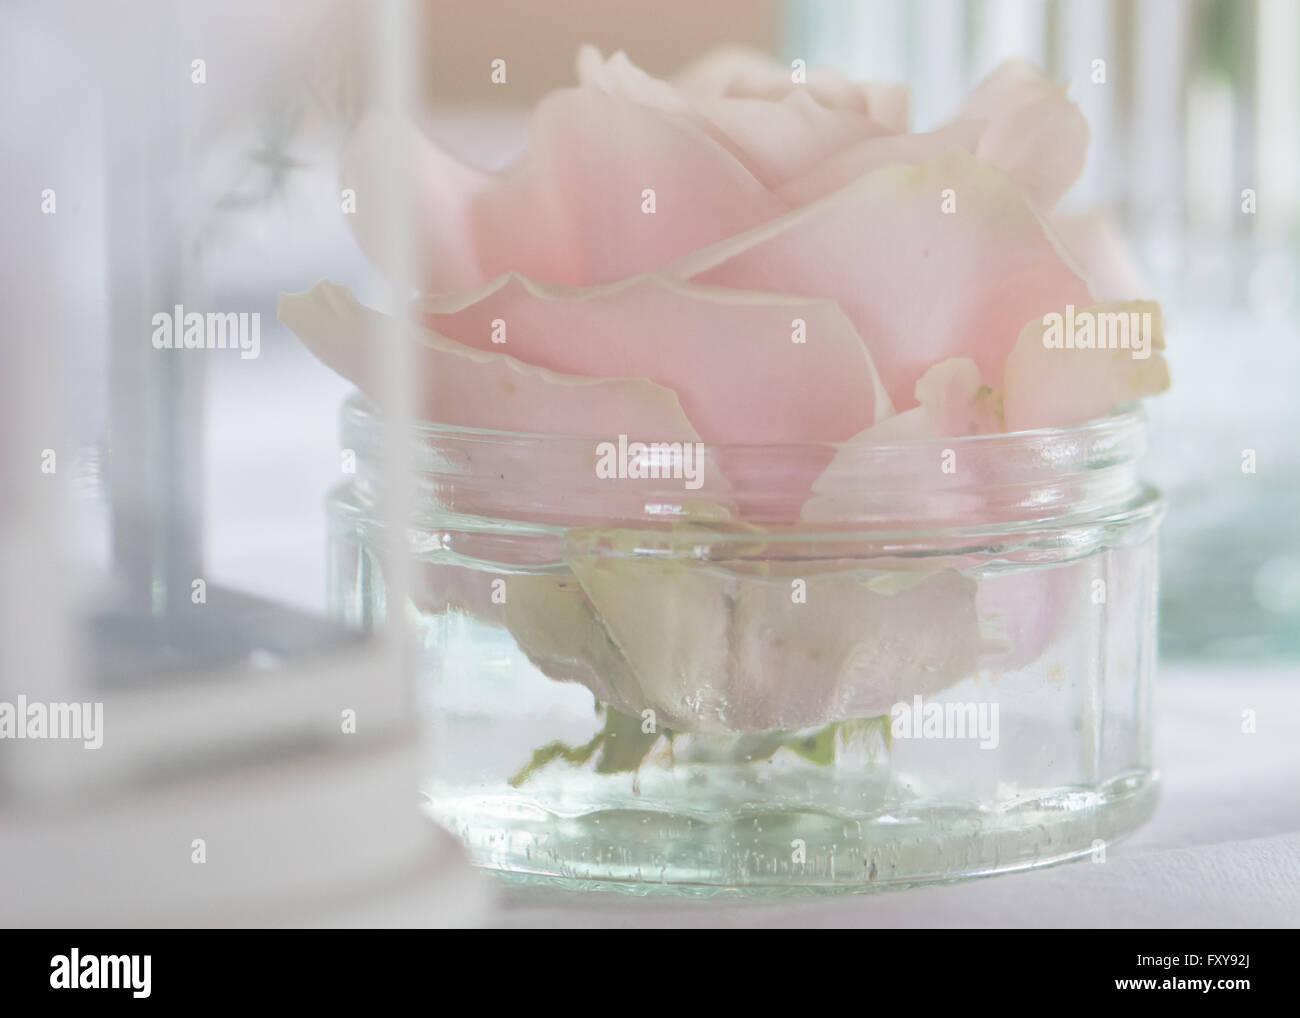 pale pastel pink rose in glass jar boho vintage wedding flowers table arrangements - Stock Image